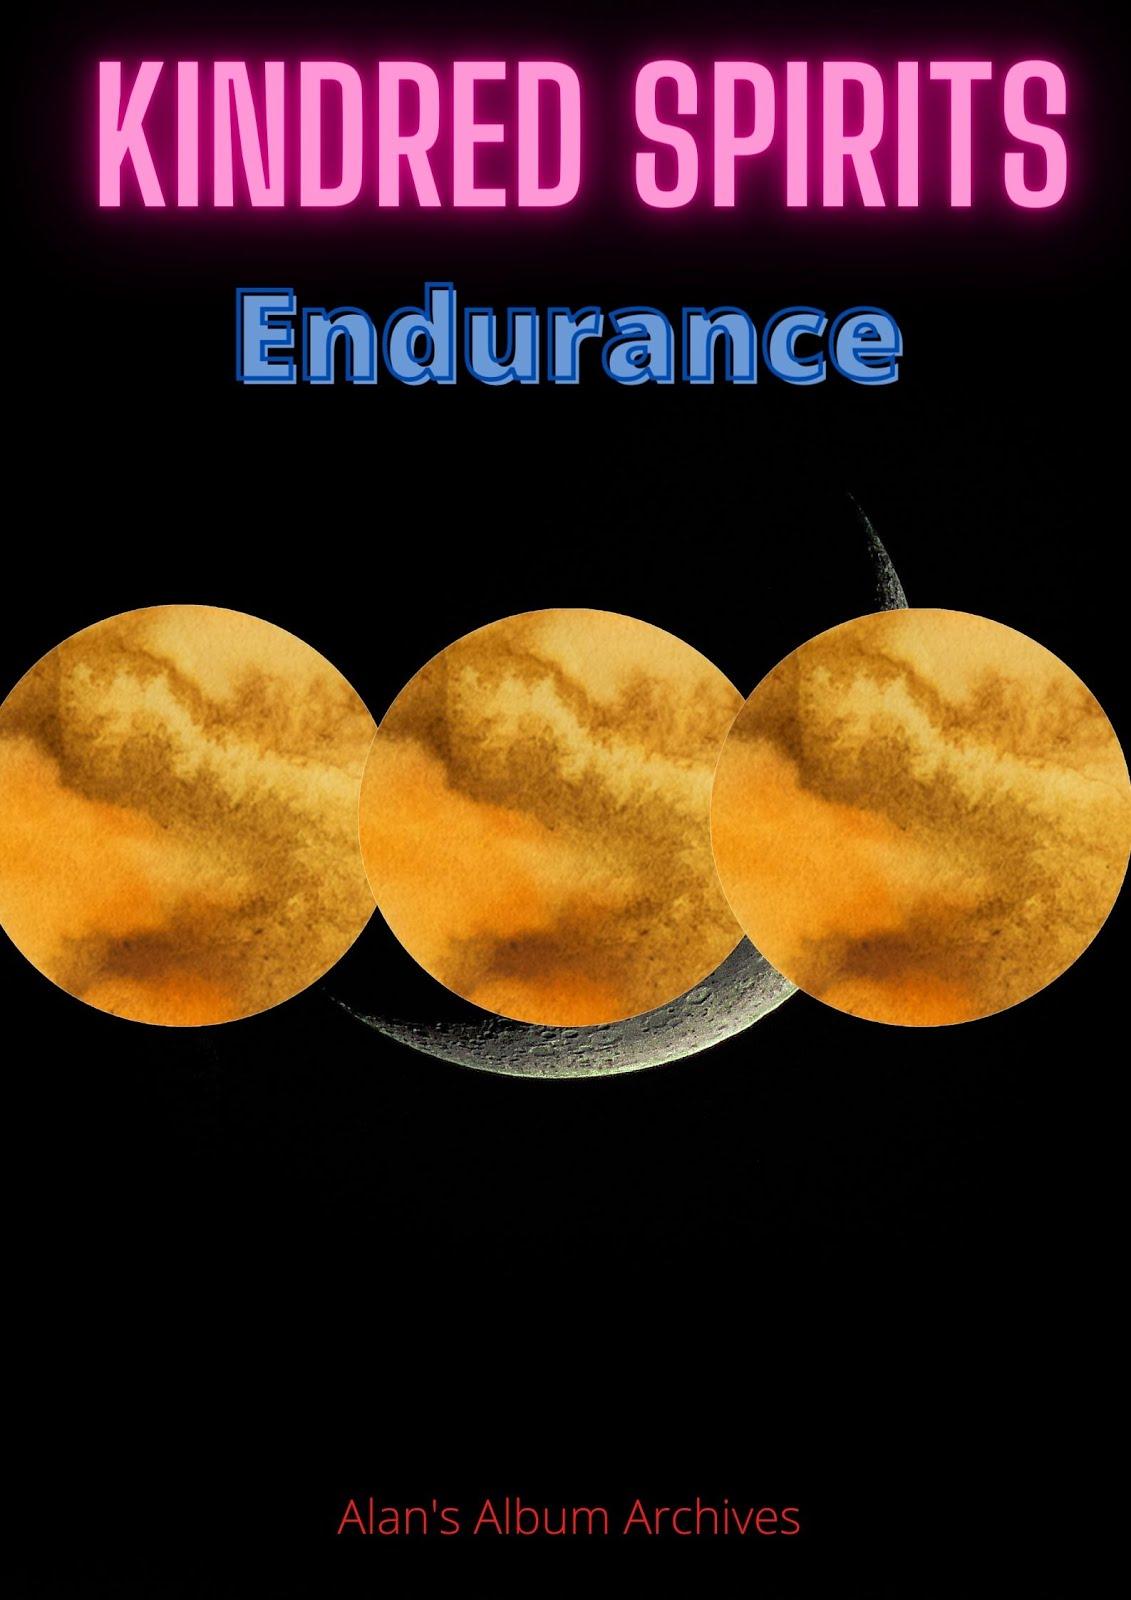 Kindred Spirits - Endurance